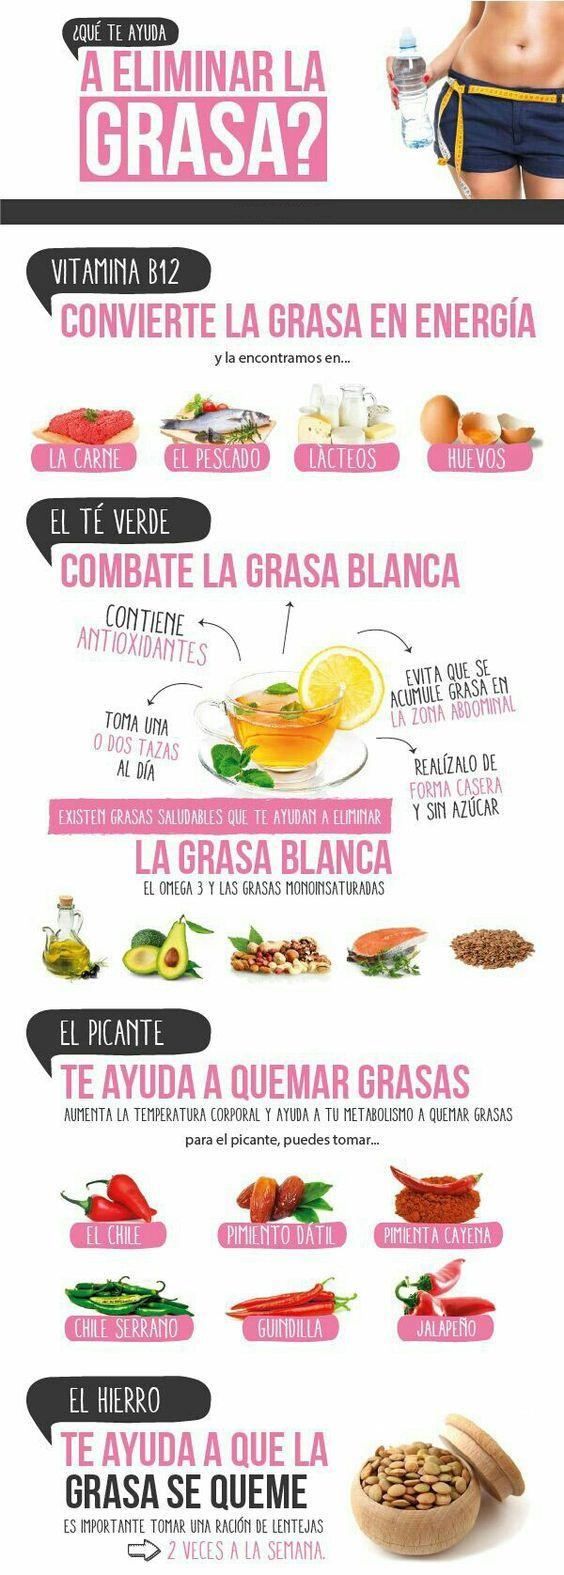 Estos Alimentos De Ayudaran A Eliminar Grasa Corporal Saludybelleza Ekala Nutrición Alimentacion Alimentos